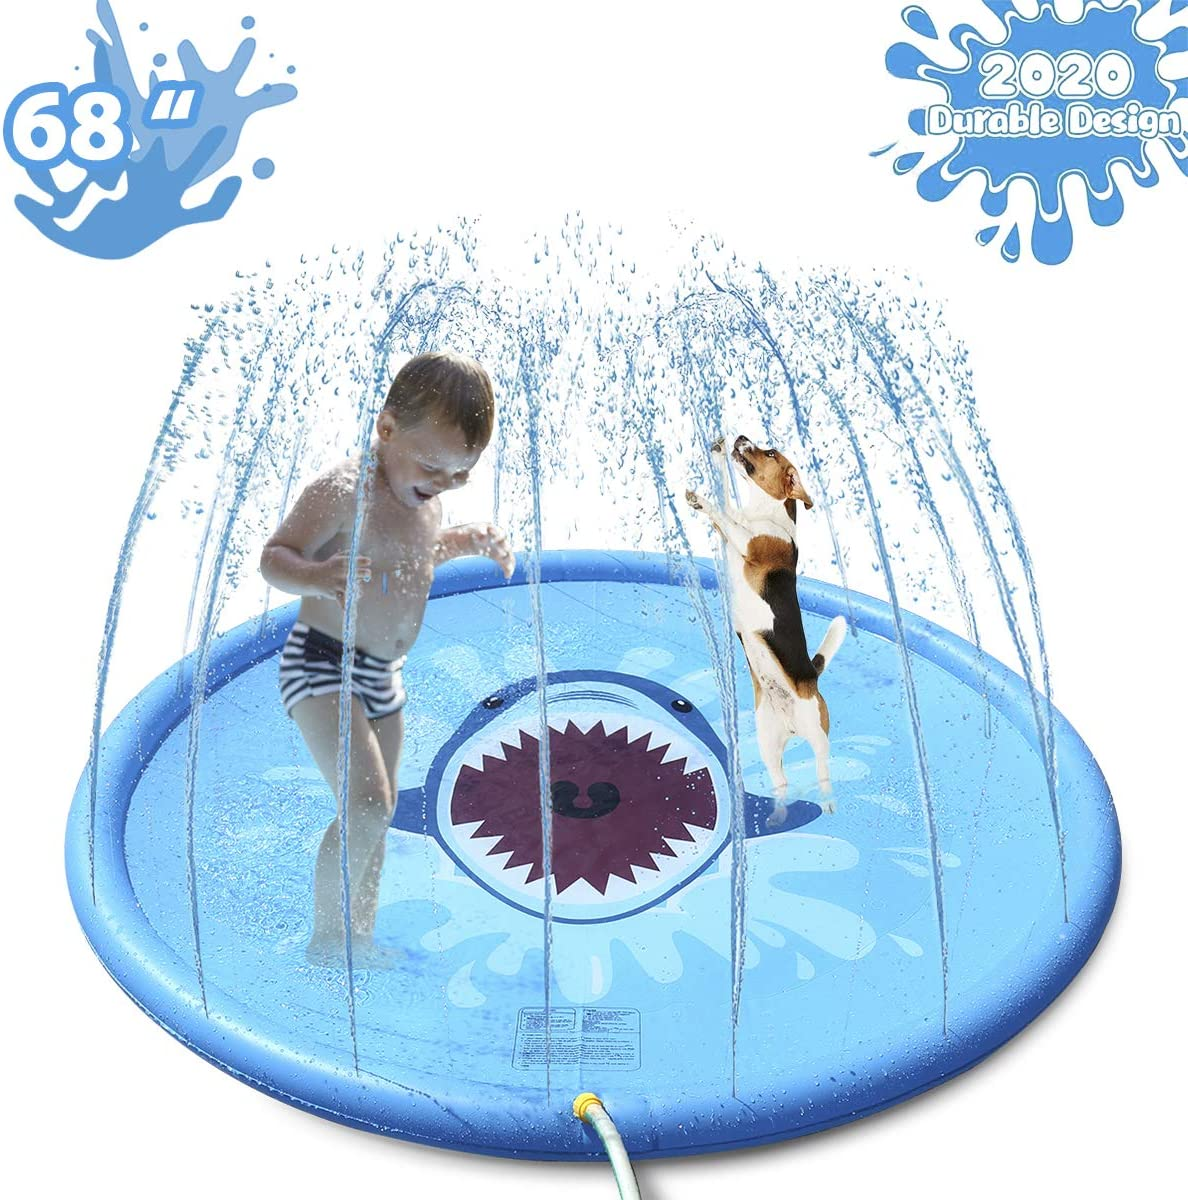 "HALOFUN 2020 New Shark Sprinkler Mat for Kids, 68"" Shark Sprinkler & Splash Plat Mat for Kids Outdoor Water Toy Splash Pad"